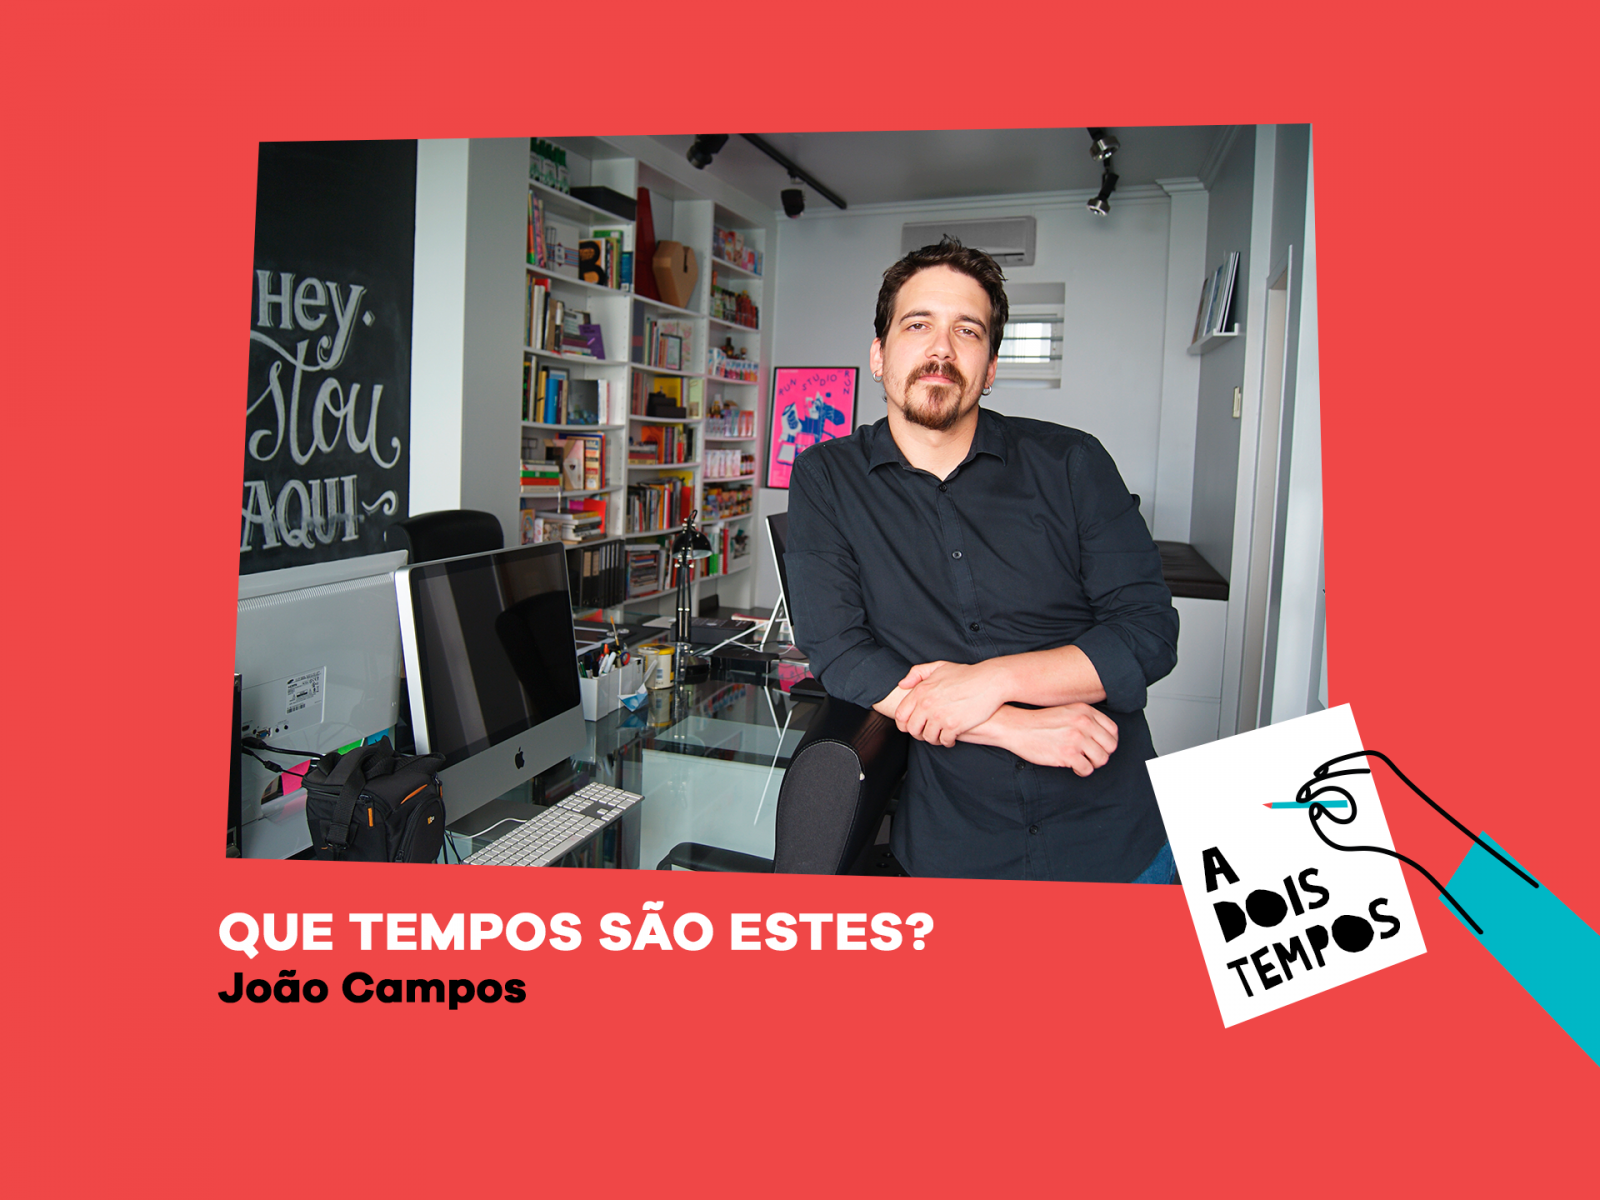 rubrica_a_dois_tempos_joao_campos_prof_academia_gerador